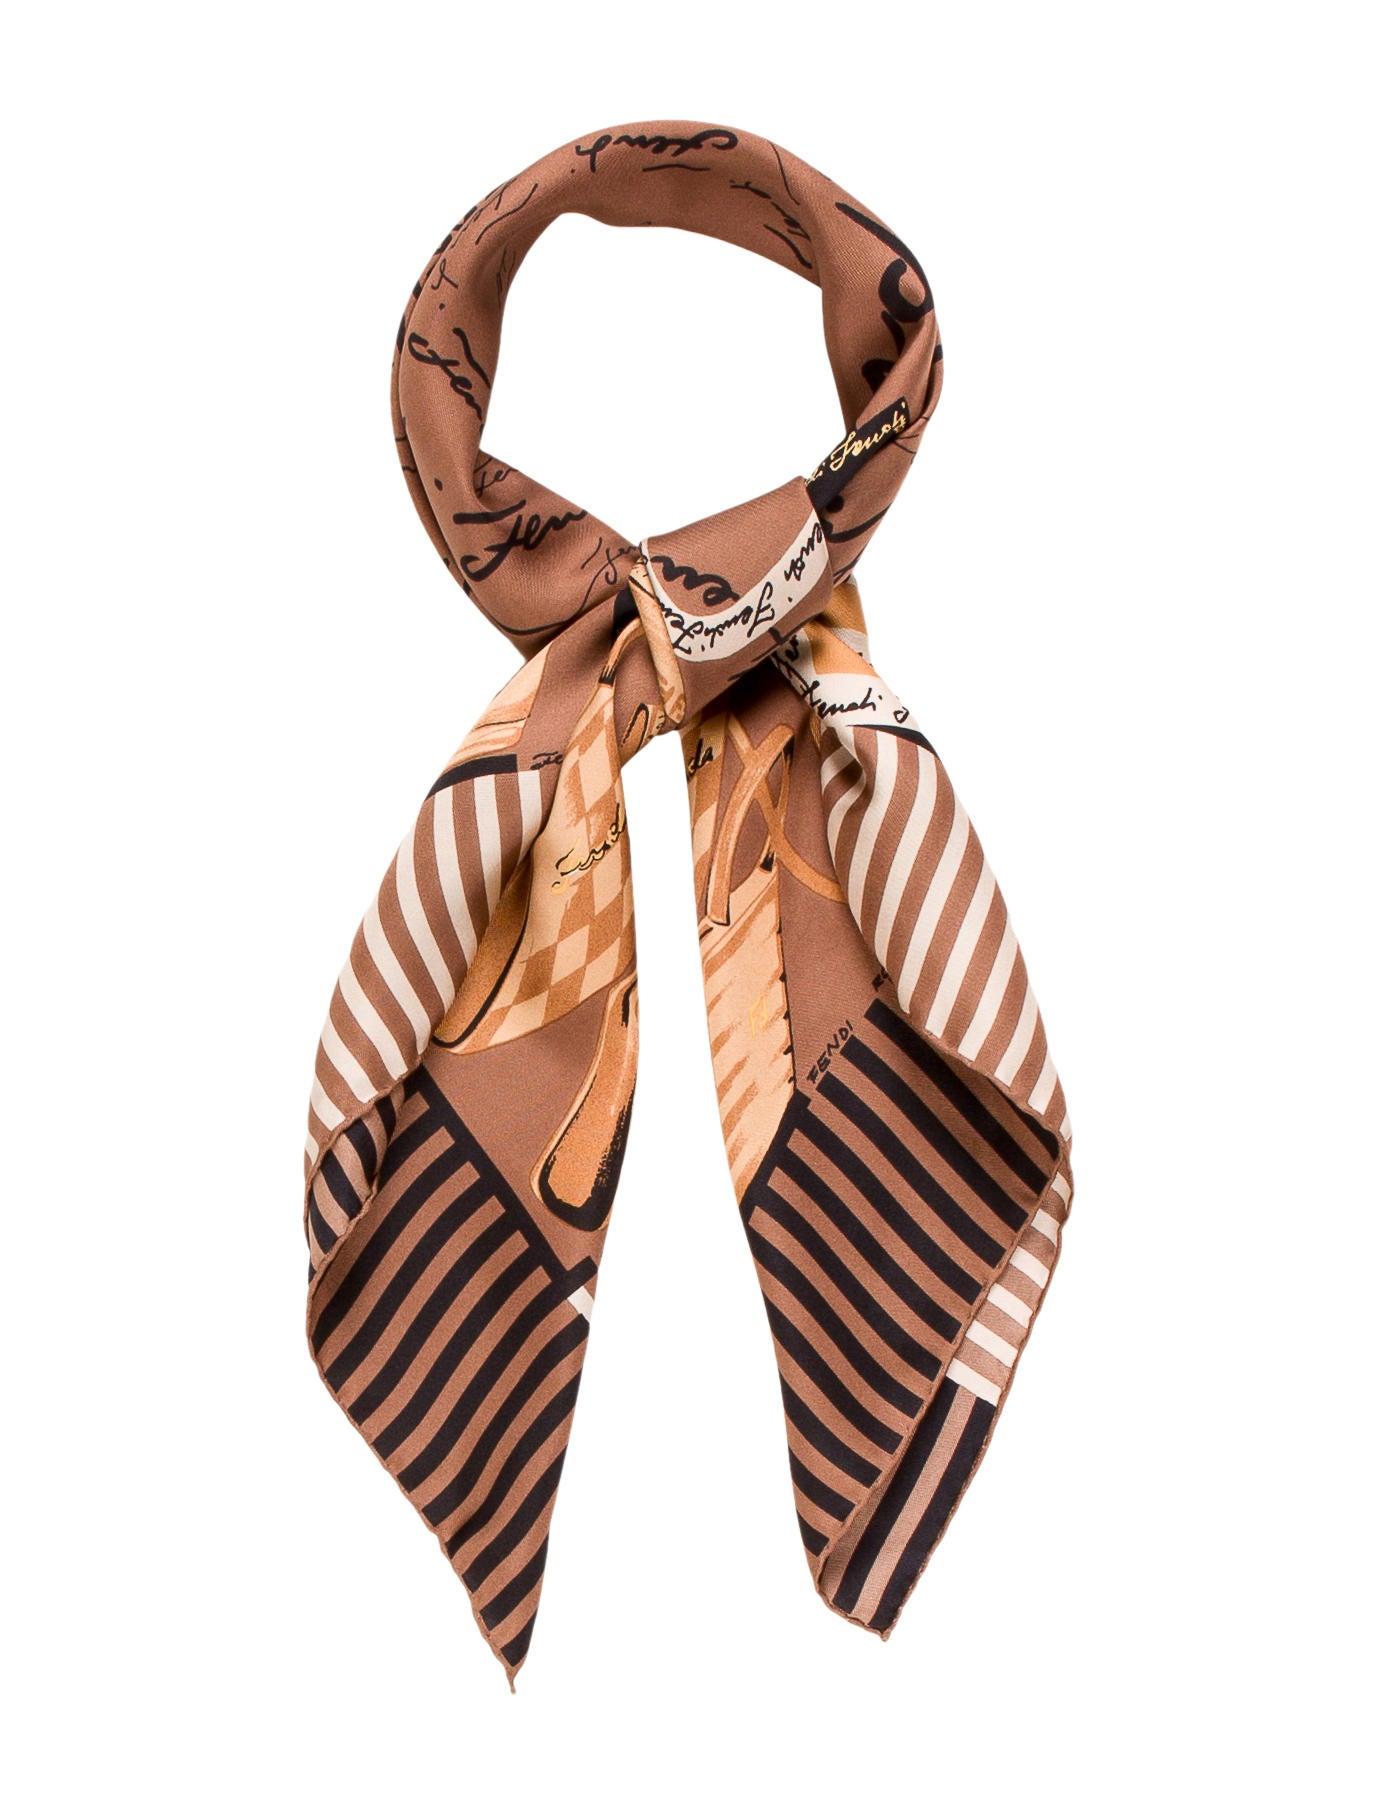 fendi handbag printed silk scarf accessories fen52595